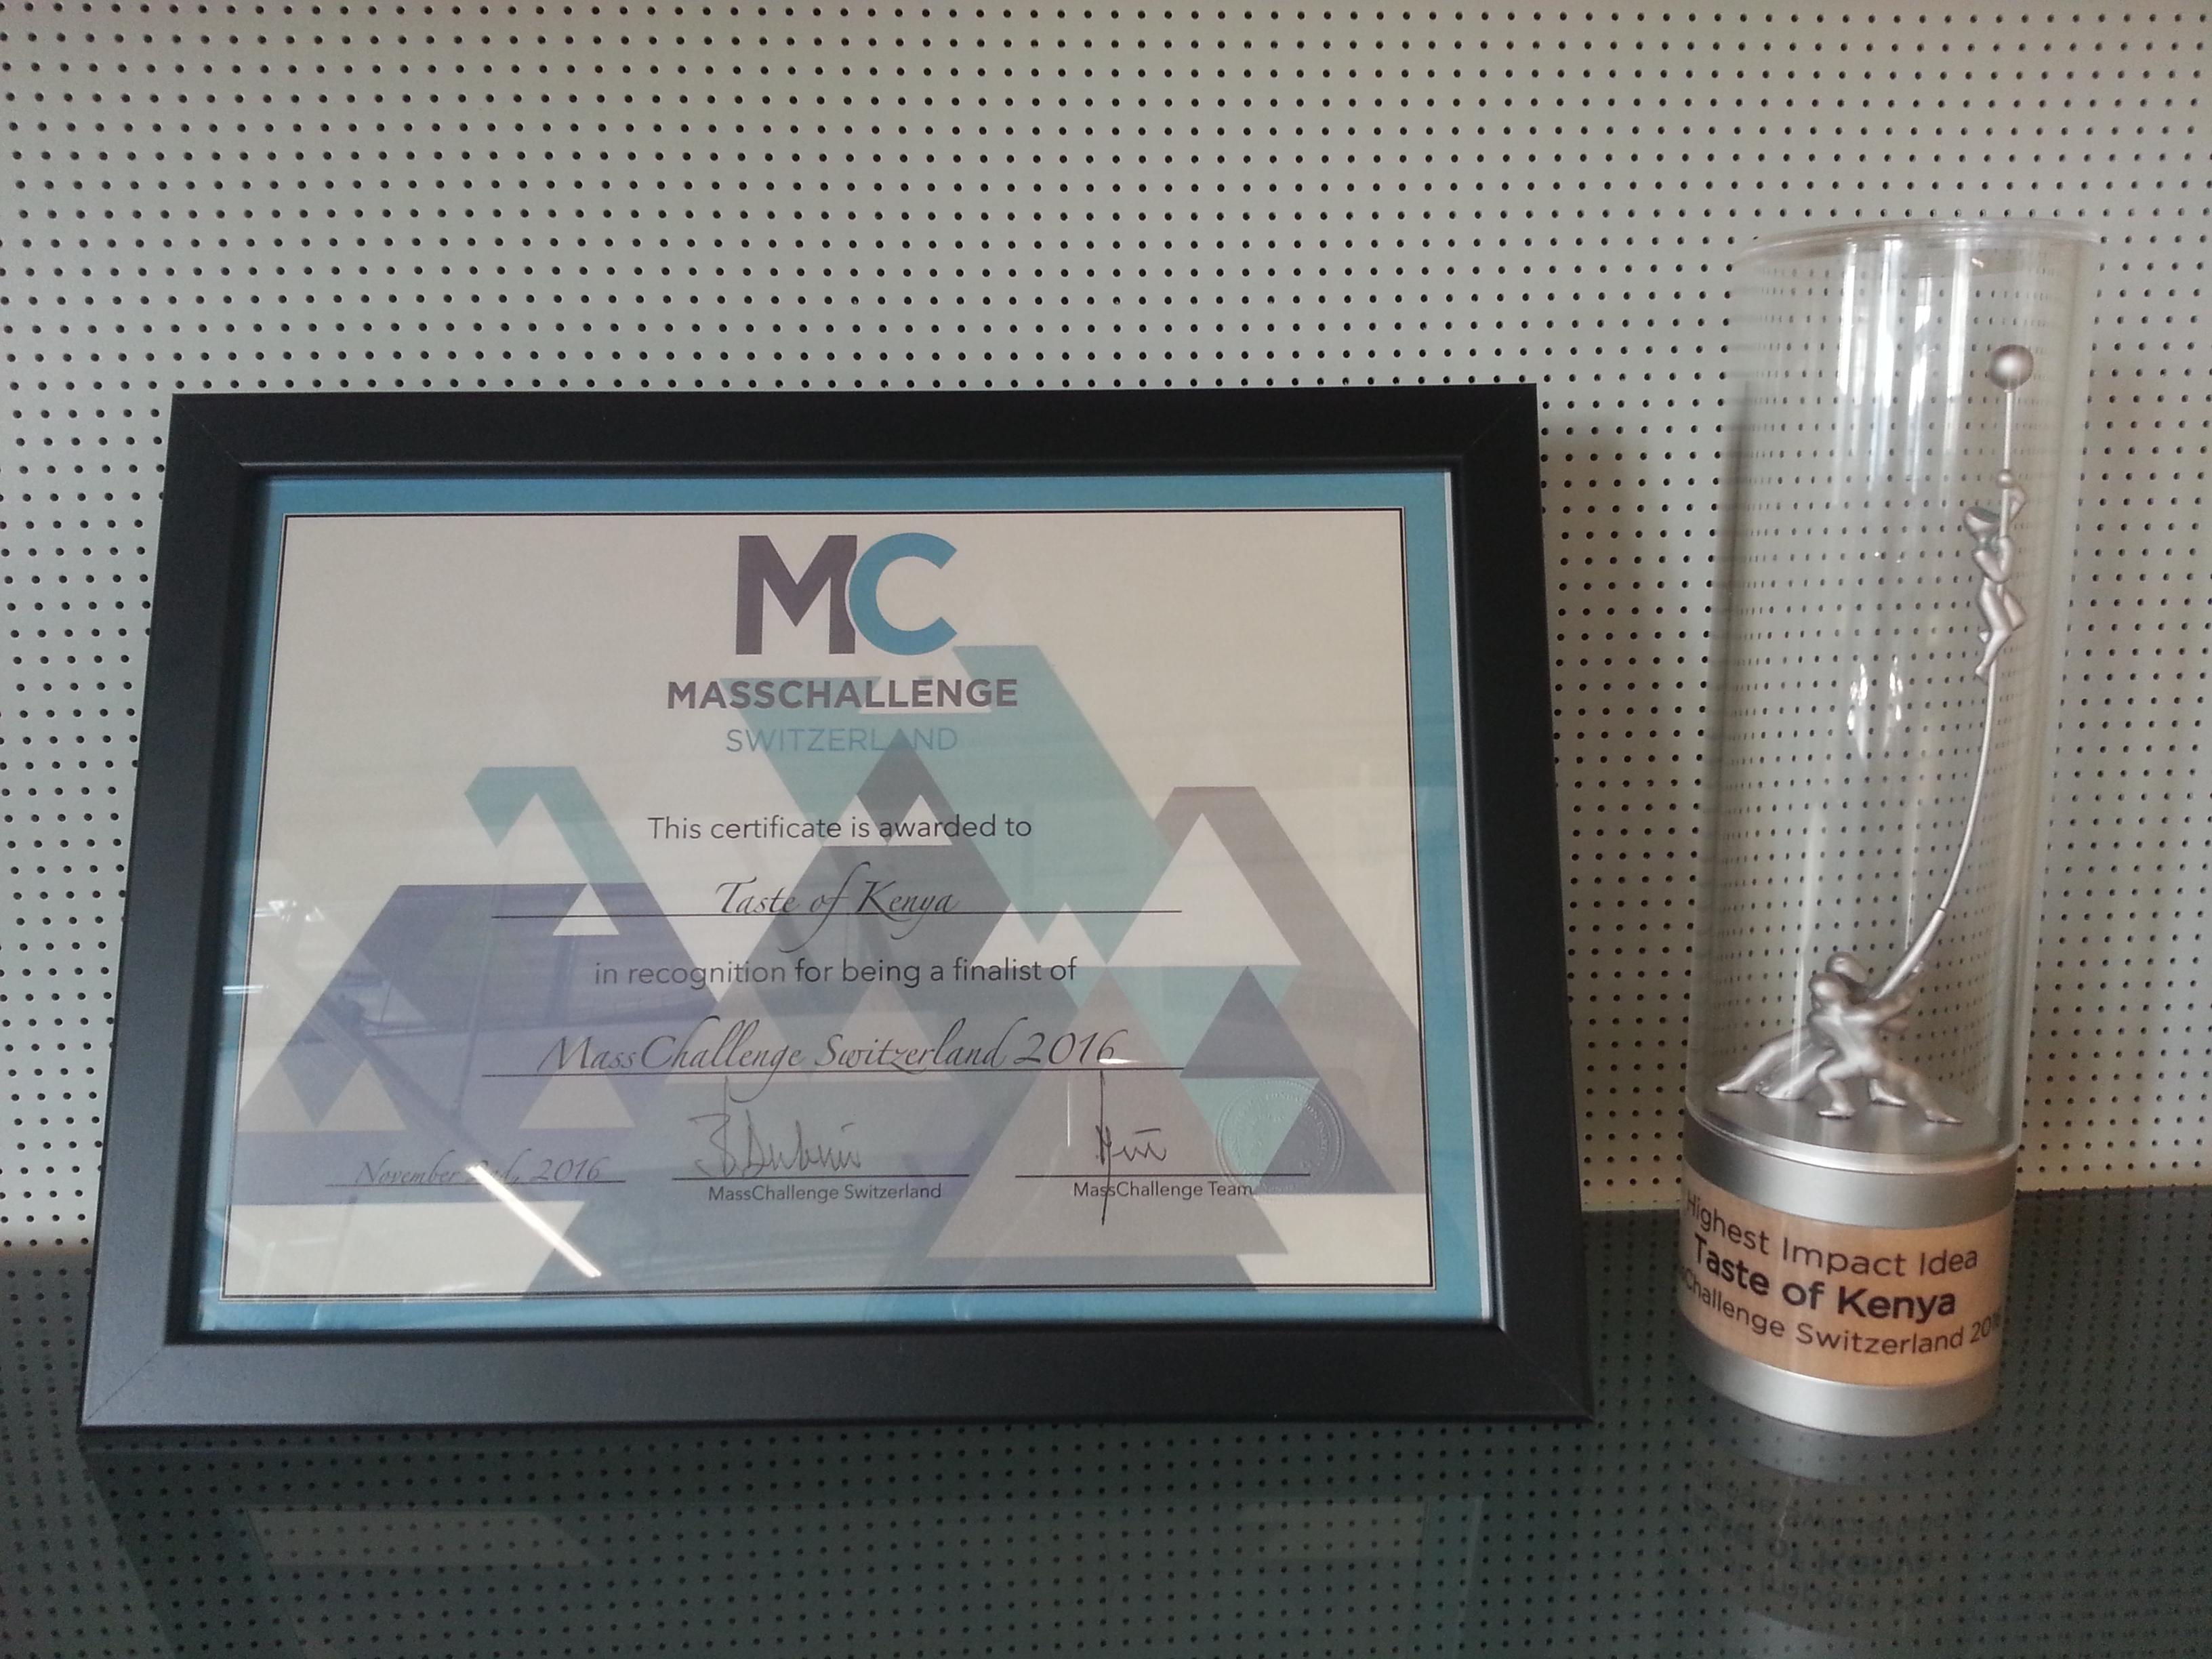 MassChallenge Switzerland Highest Impact Award (Nov 2016)